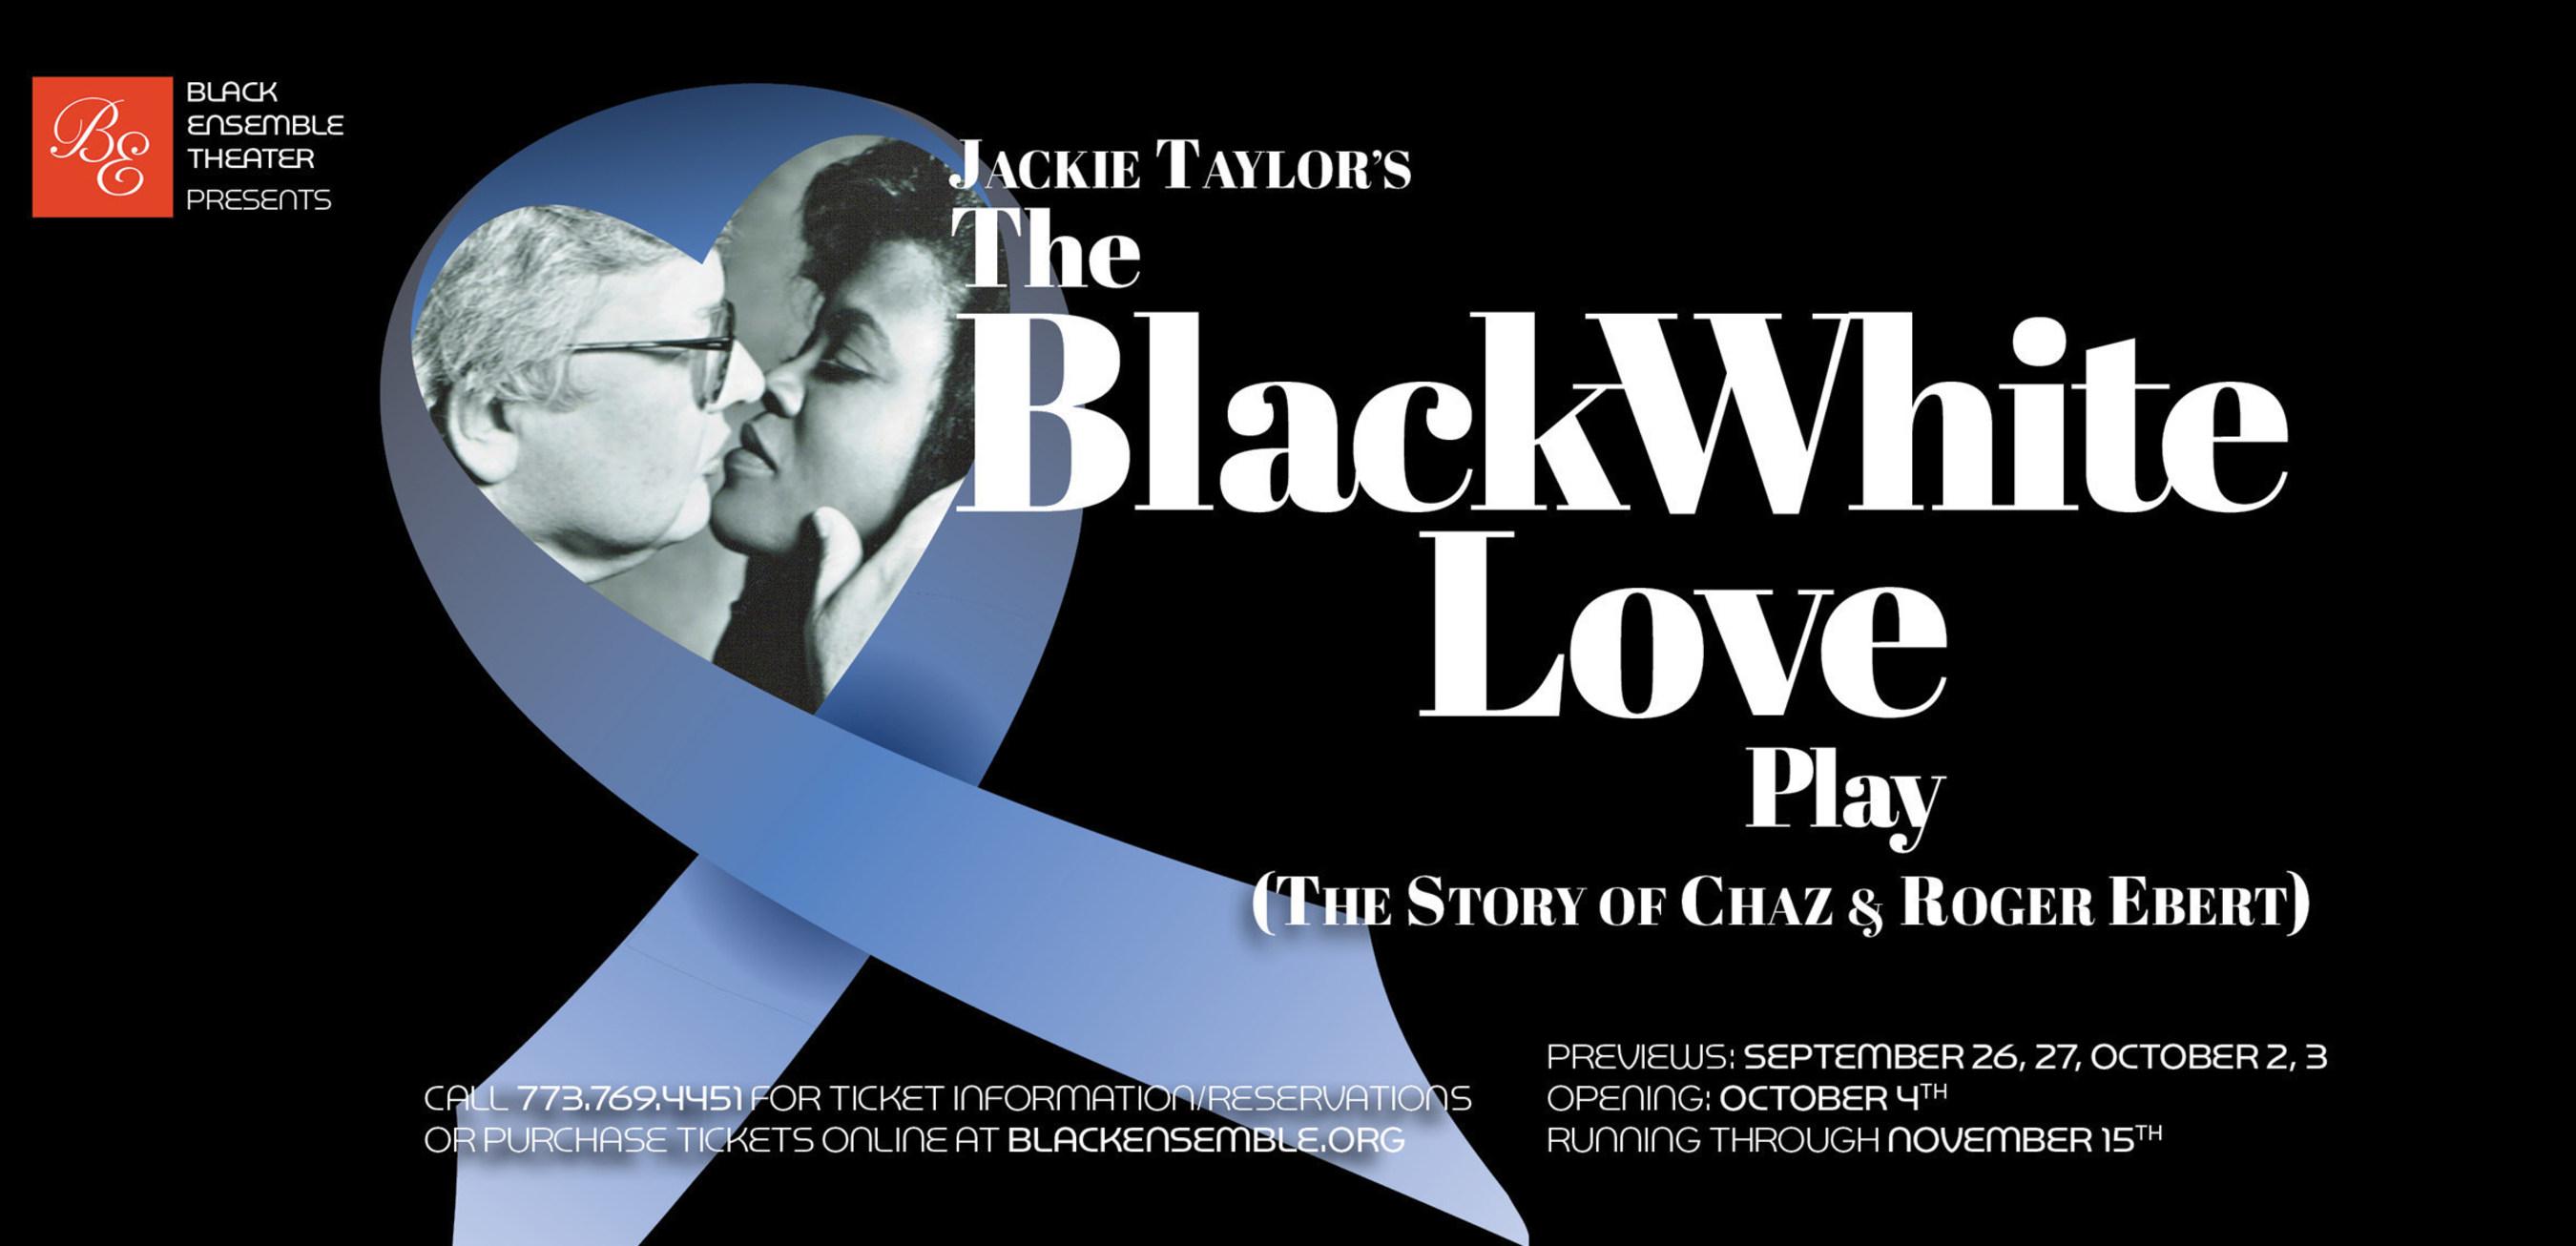 RogerEbert.com announces the premiere of THE BLACK WHITE LOVE PLAY (The Story of Chaz & Roger Ebert)